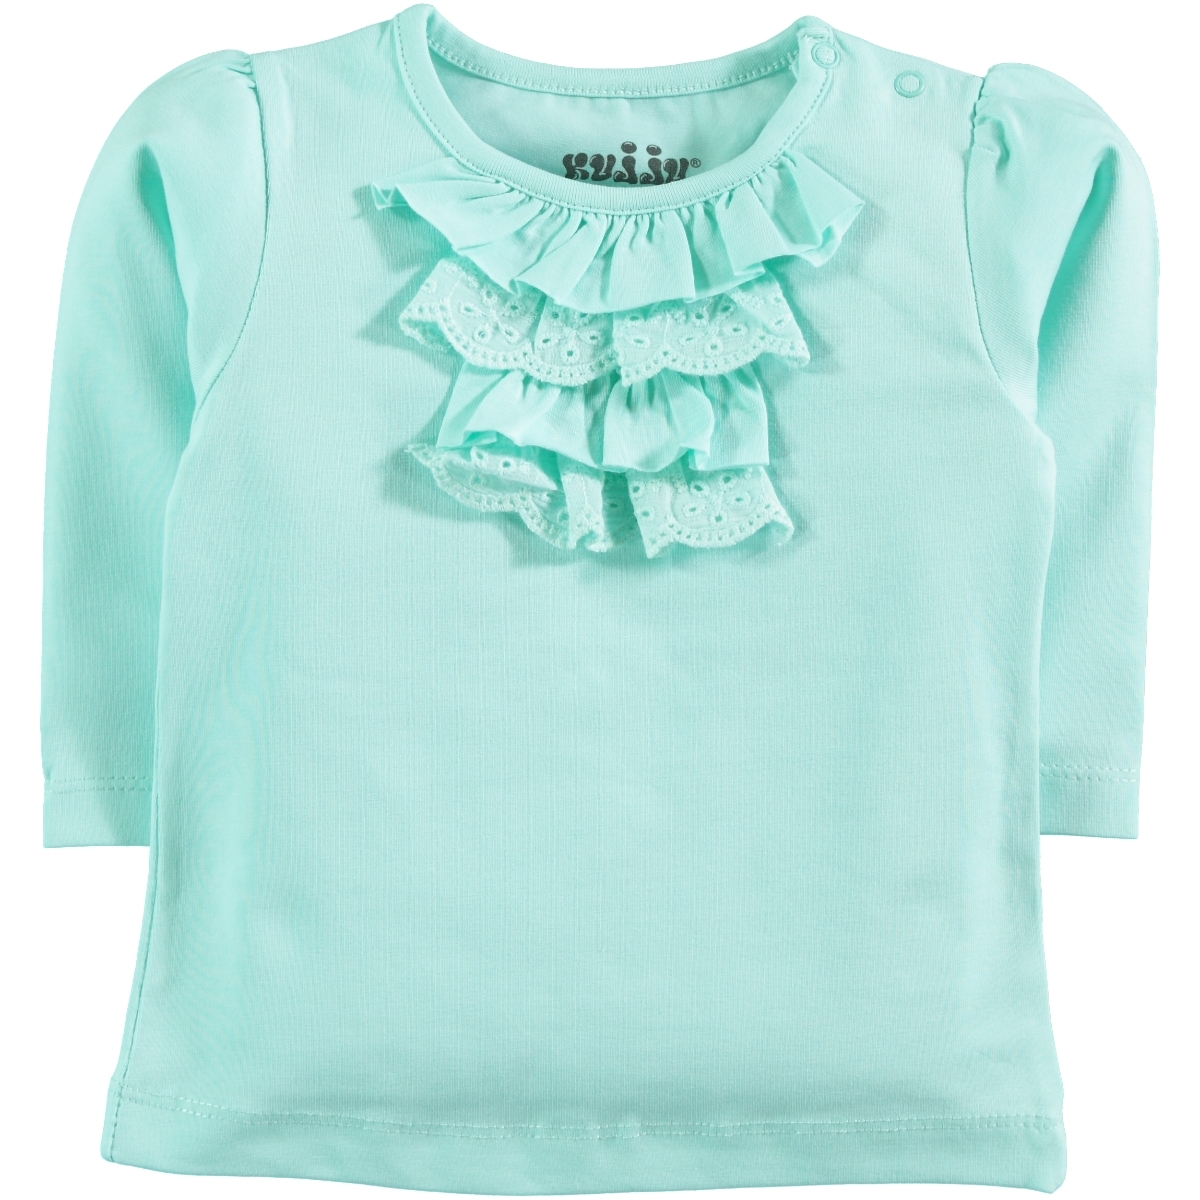 Kujju 6-18 Months Baby Girl Mint Green Sweatshirt